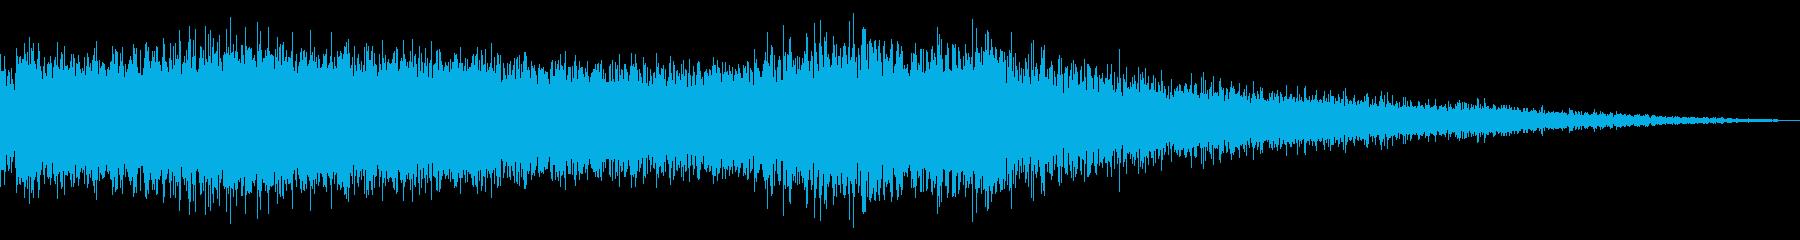 Space Fx:メタルサンダーの再生済みの波形